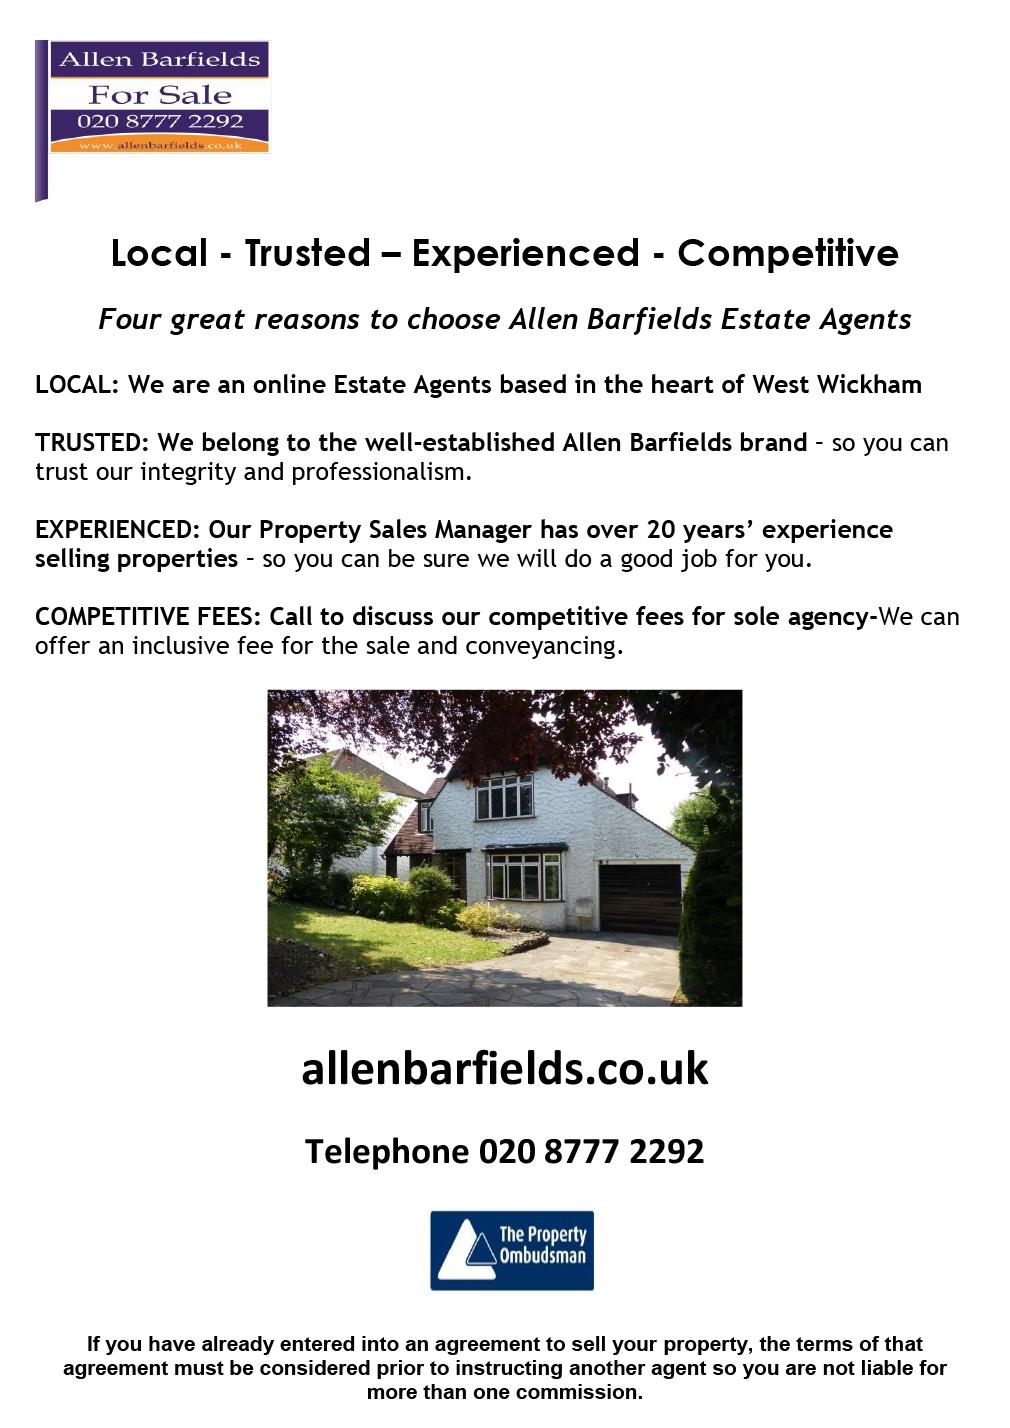 Allen-Barfields-Estate-Agency-ad-Aug-2014